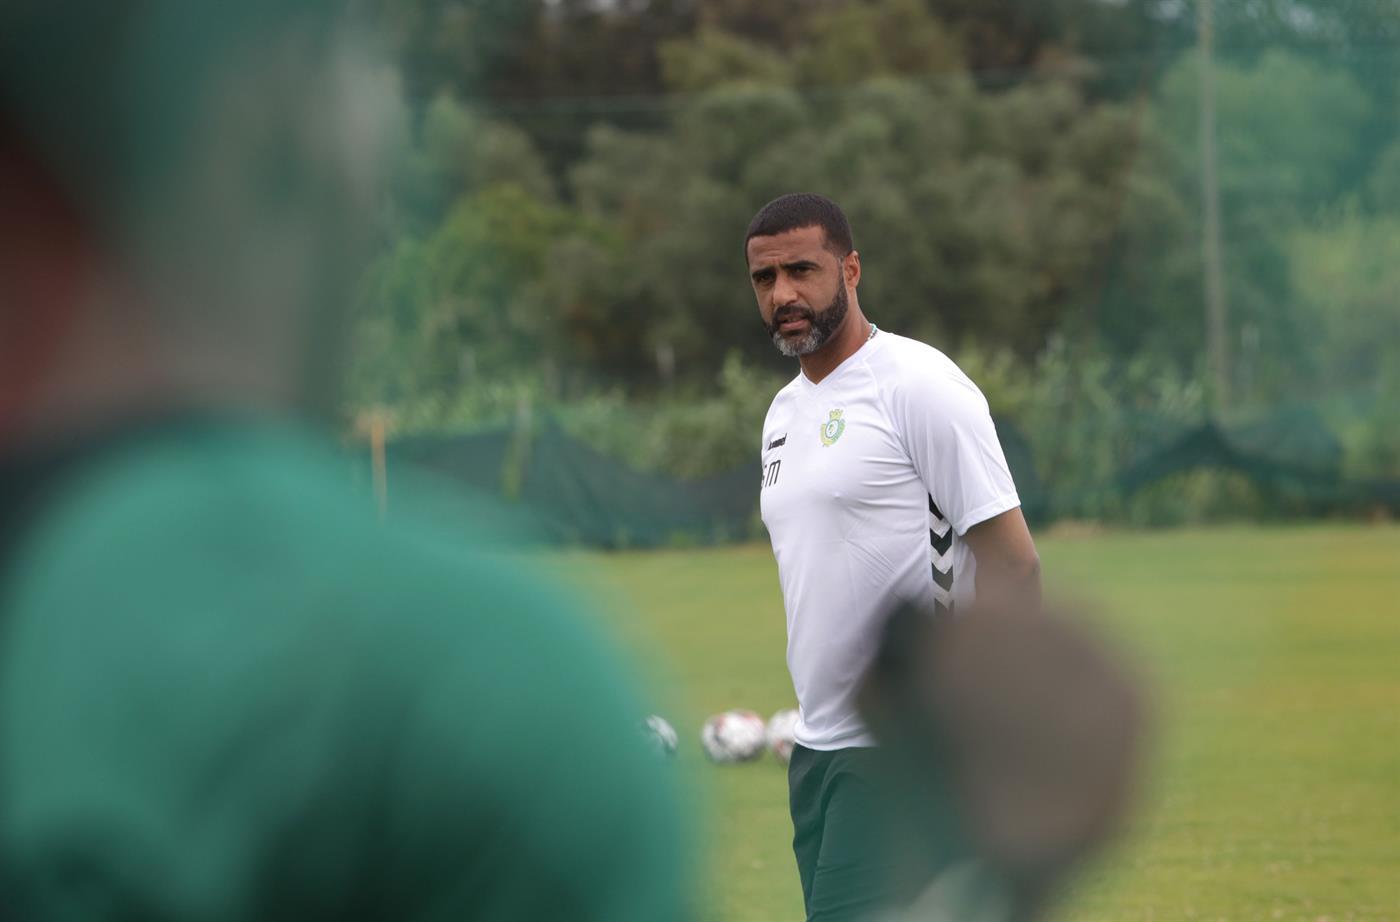 Setúbal 24/06/2019 - Sandro Mendes orienta  o primeiro treino  o primeiro treino da época 2019/20 no